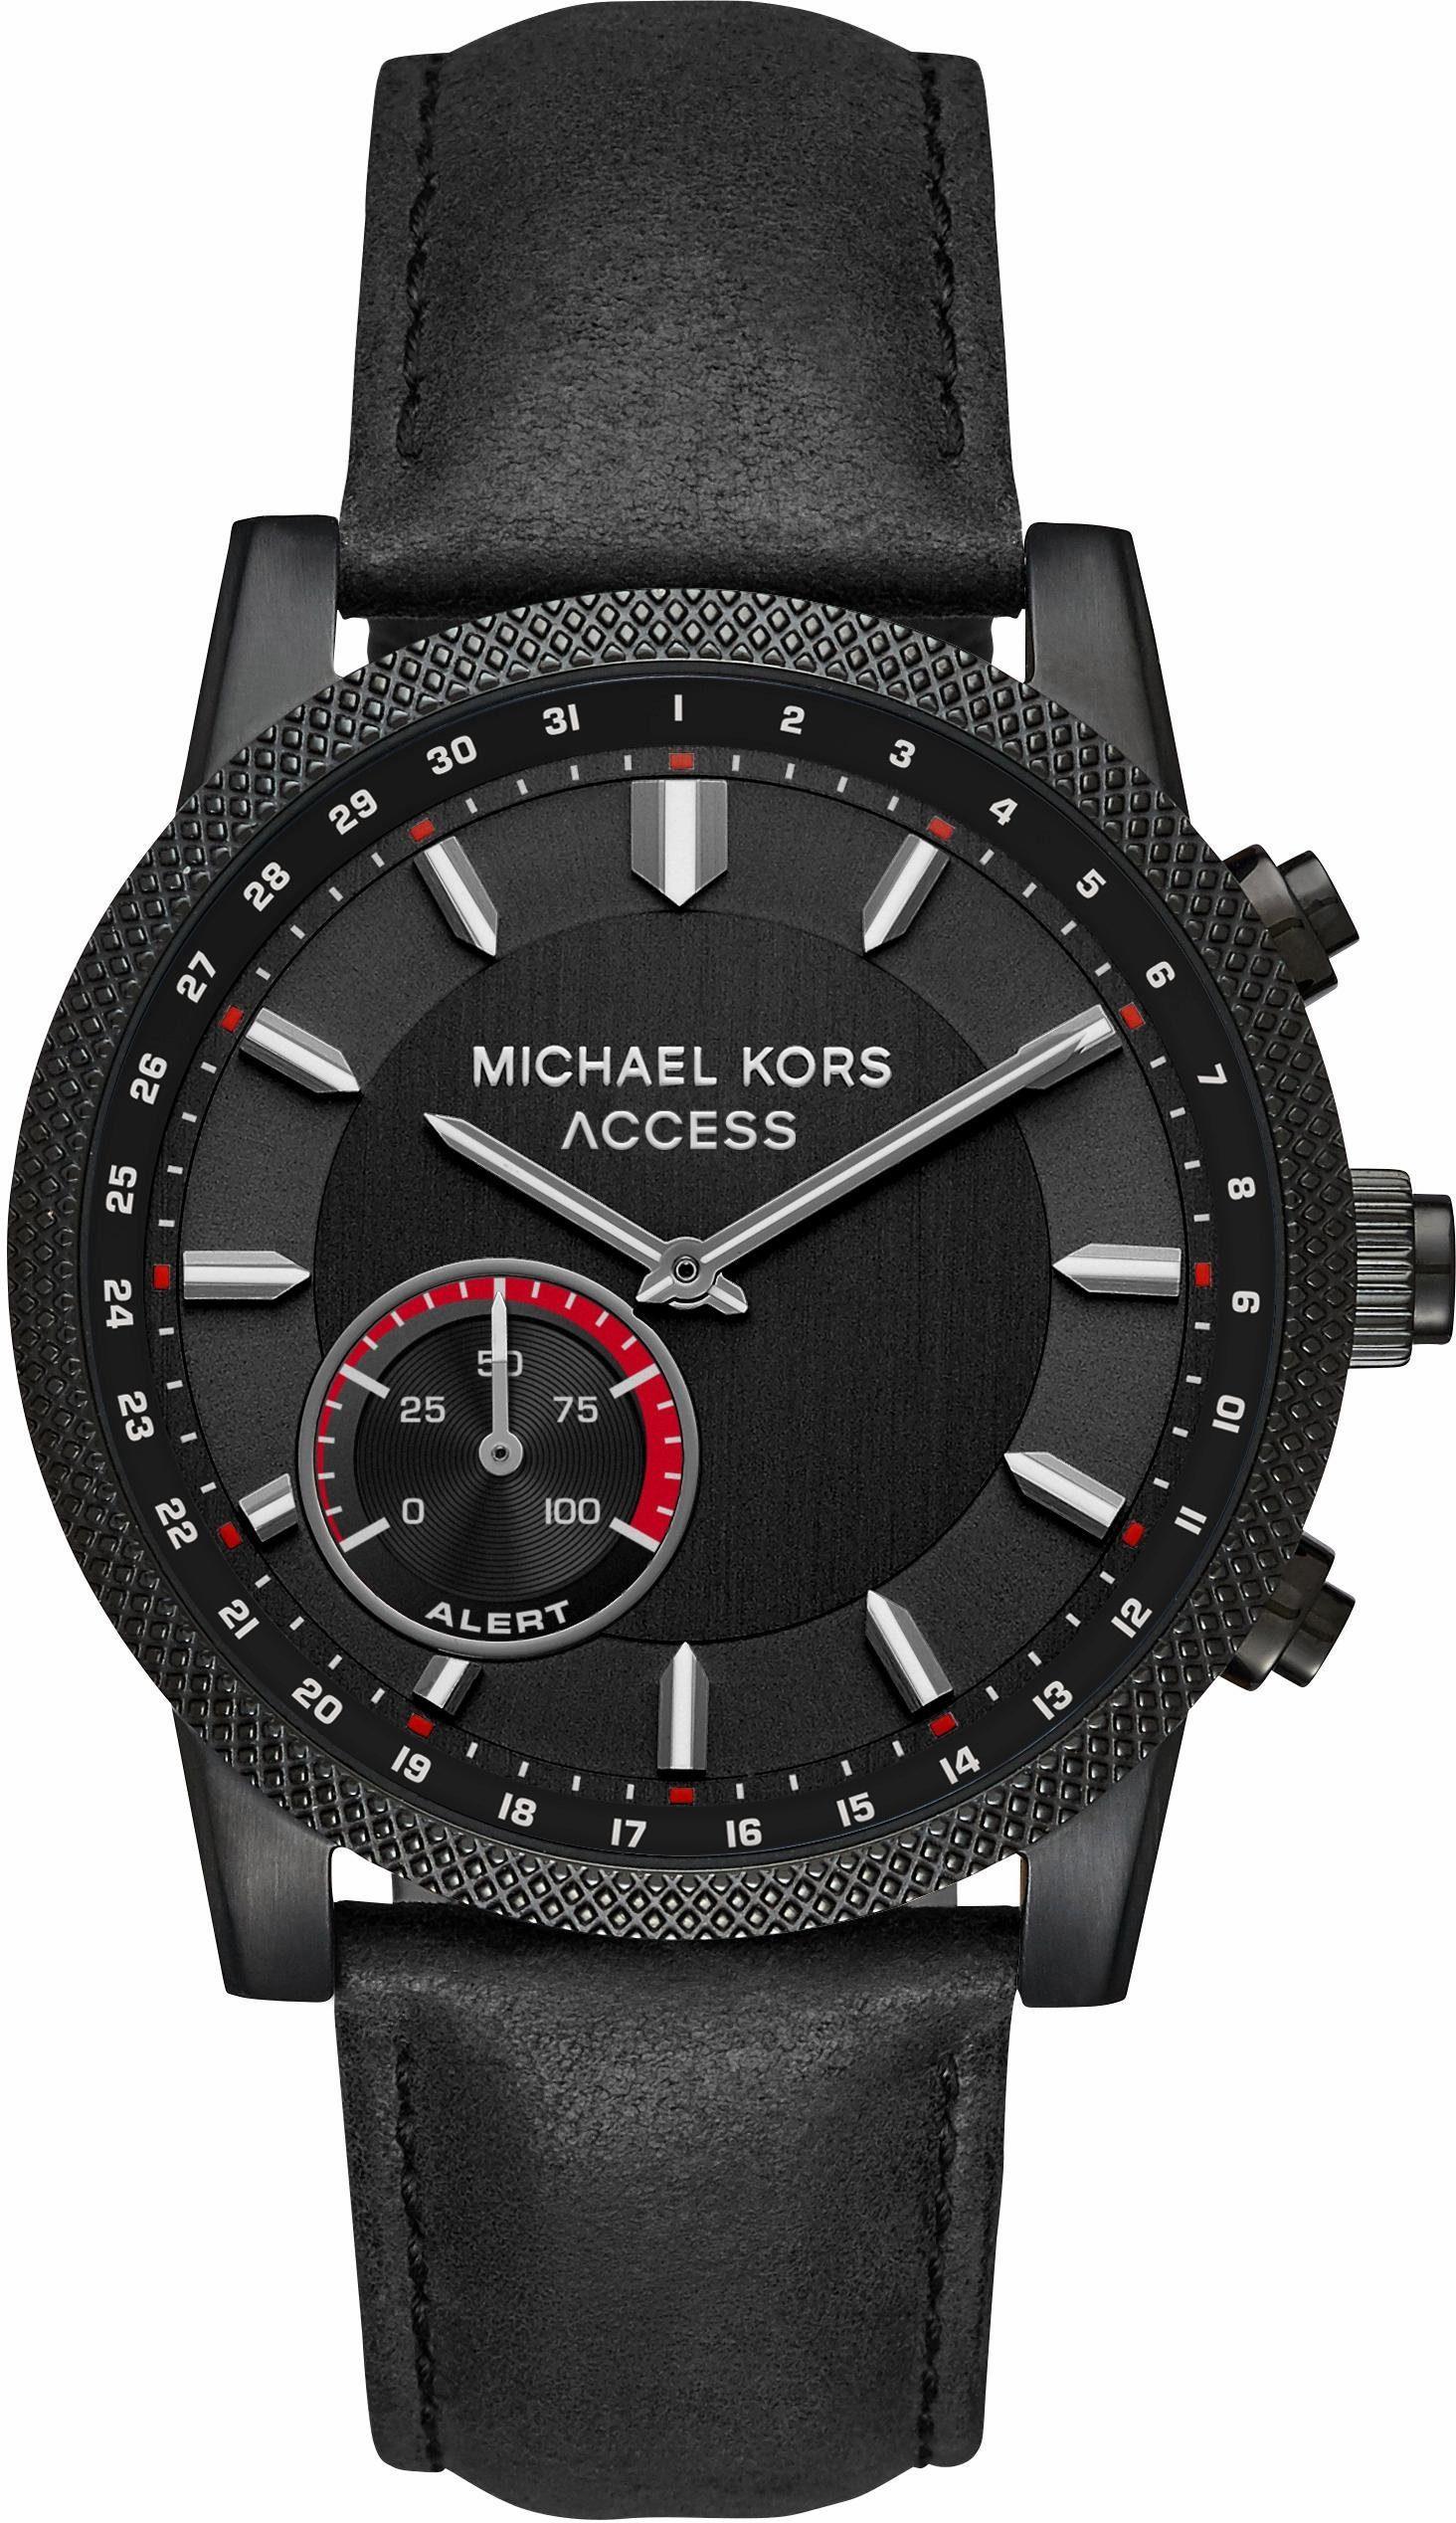 MICHAEL KORS ACCESS HUTTON, MKT4025 Smartwatch (Android Wear)